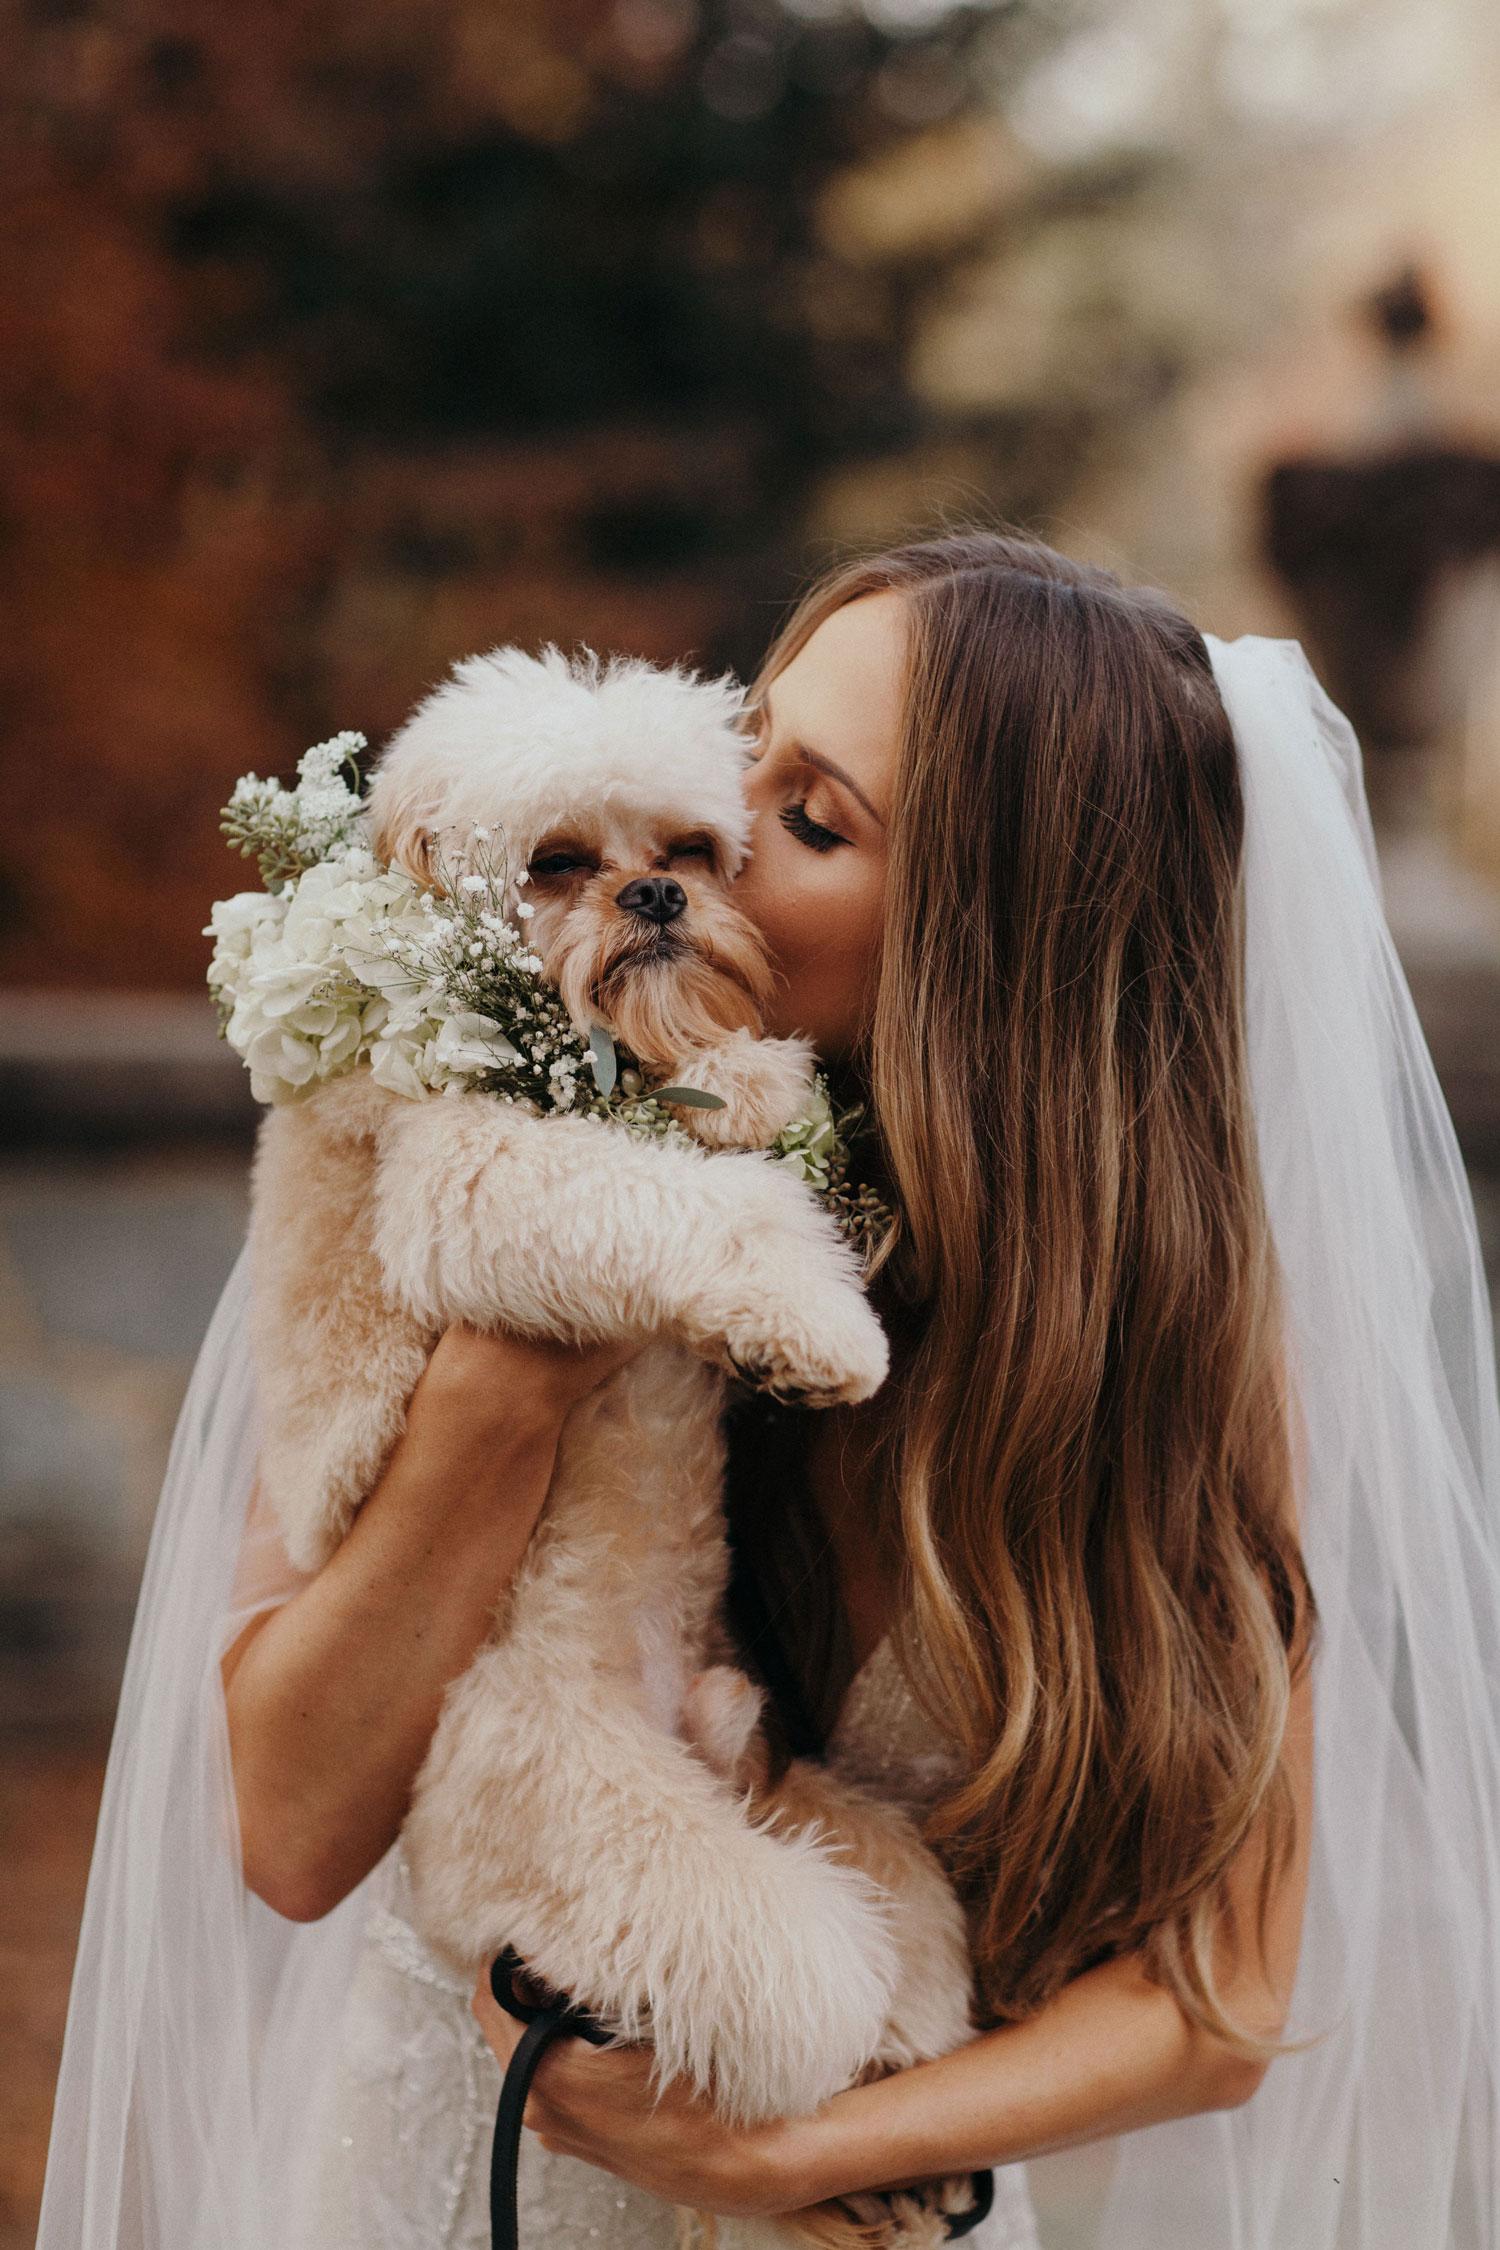 suzanna villarreal kissing dog on cheek before wedding to alex wood wedding ideas